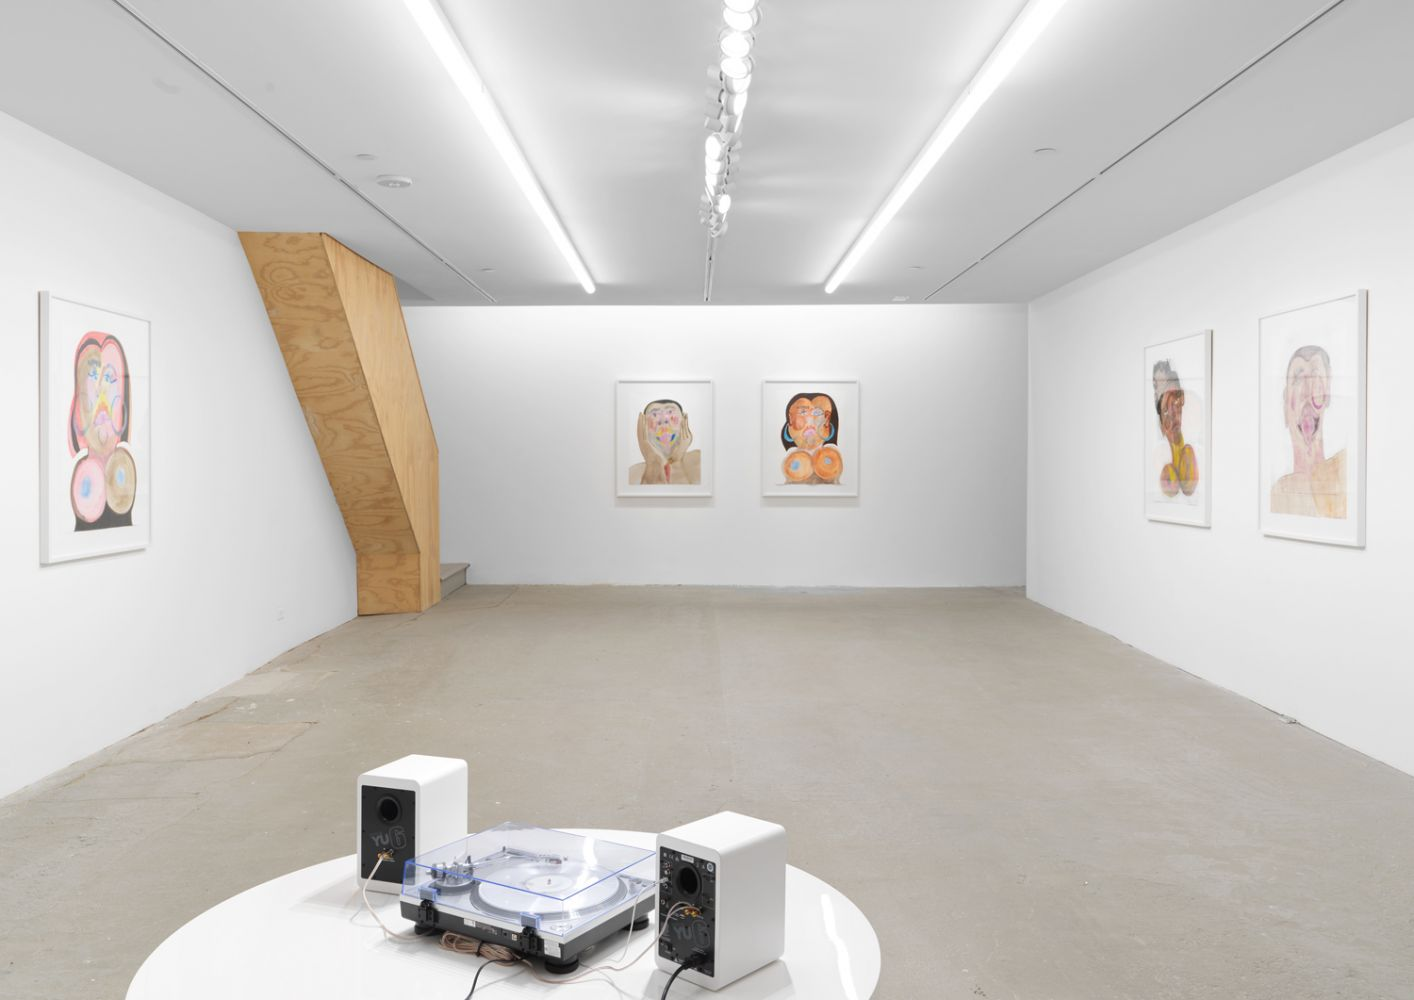 Exhibition View, Tschabalala Self, Cotton Mouth, Eva Presenhuber, New York, 2020 install 16